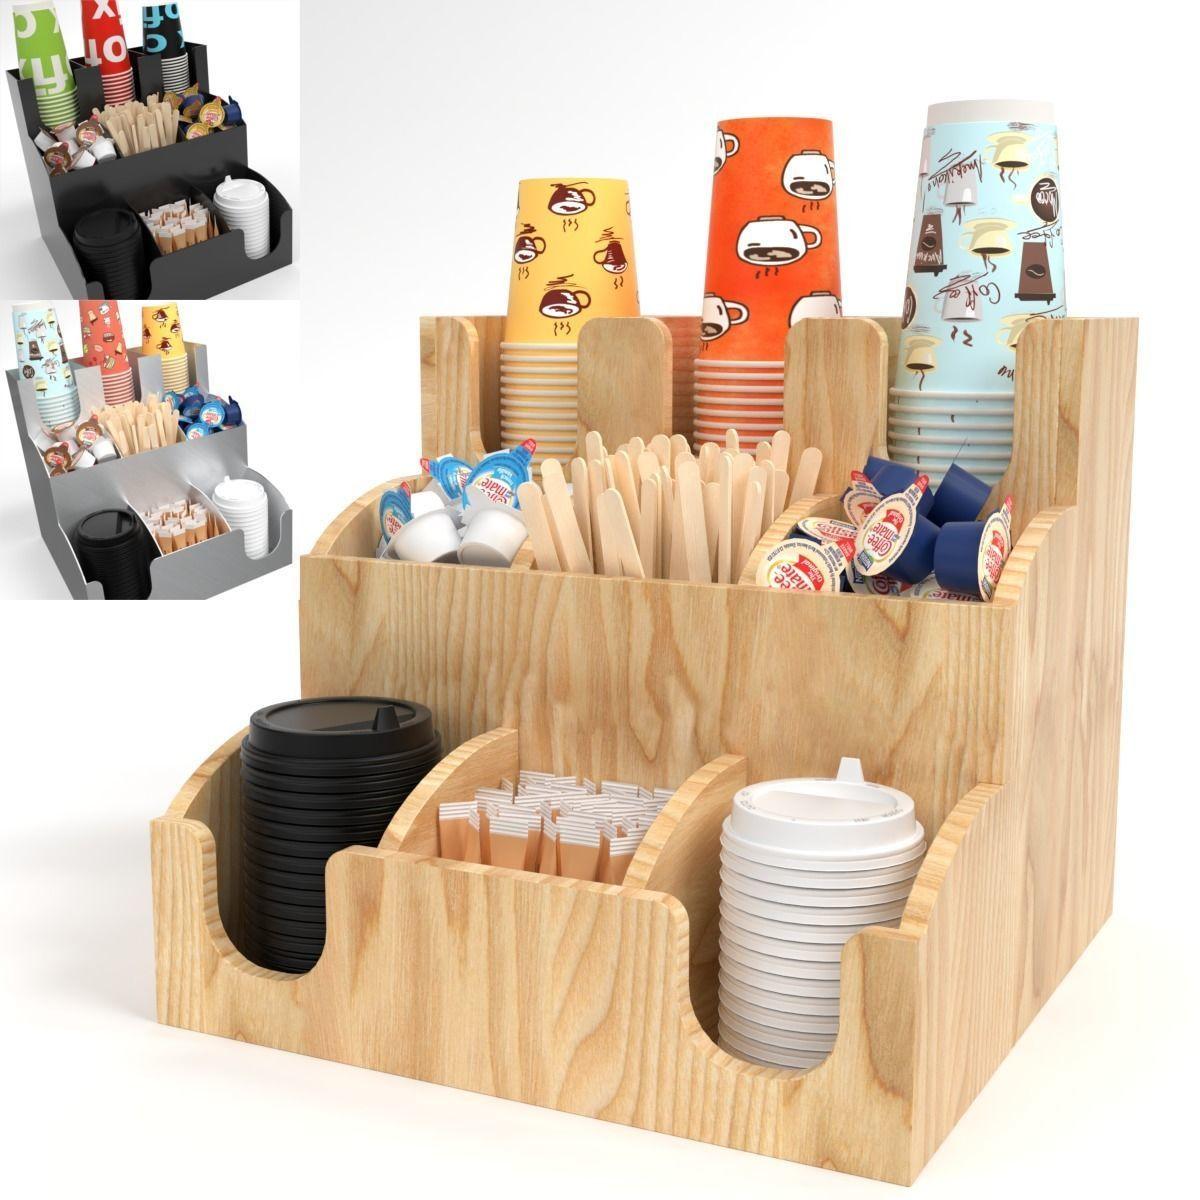 Bar Holder Organizer Paper Cup Dispenser set Blender Cycles